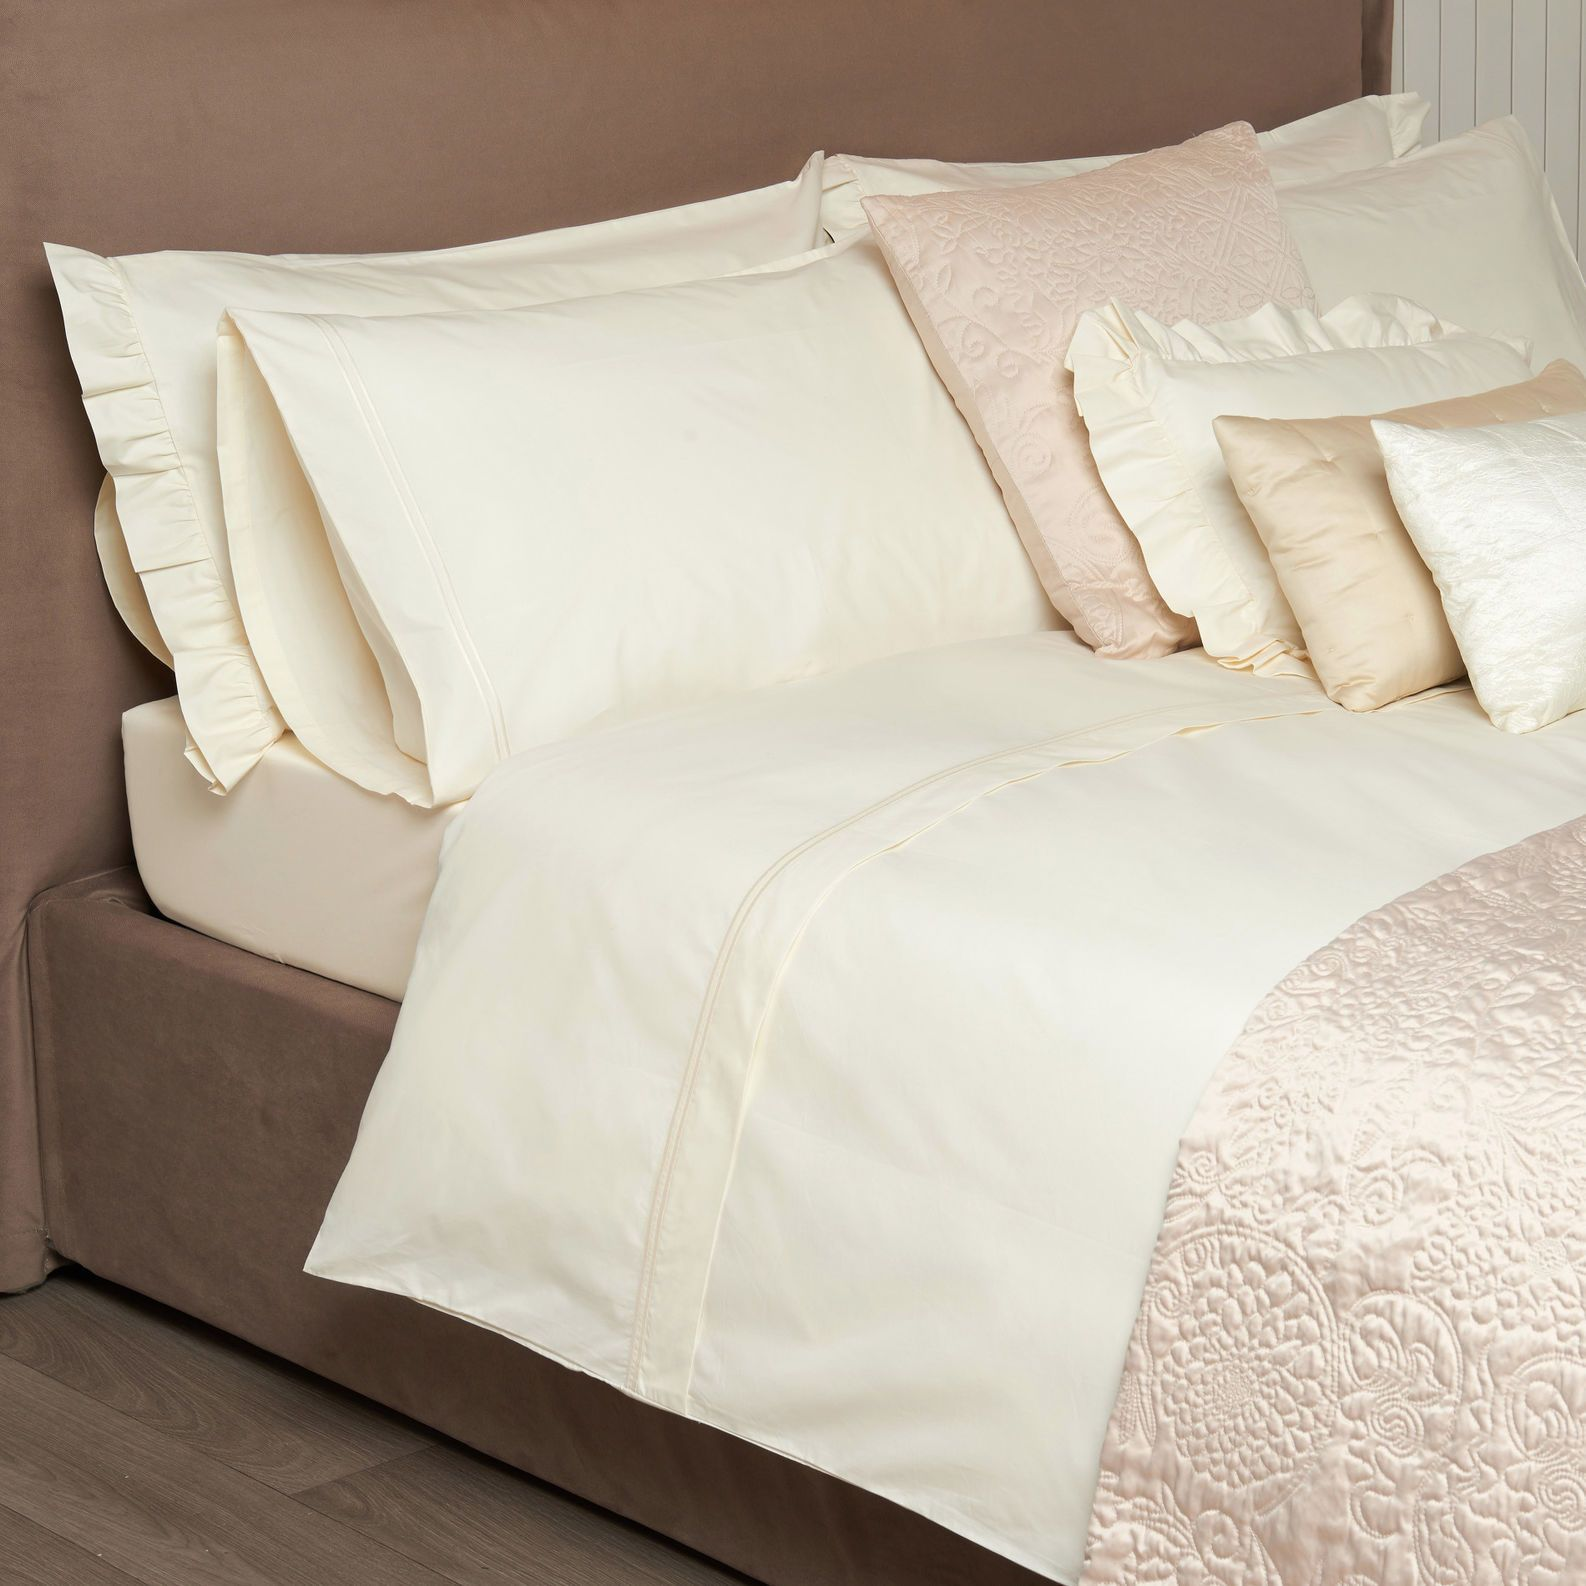 Copripiumino Percalle.Set Copripiumino Percalle Portofino Bed Pillows Pillow Cases